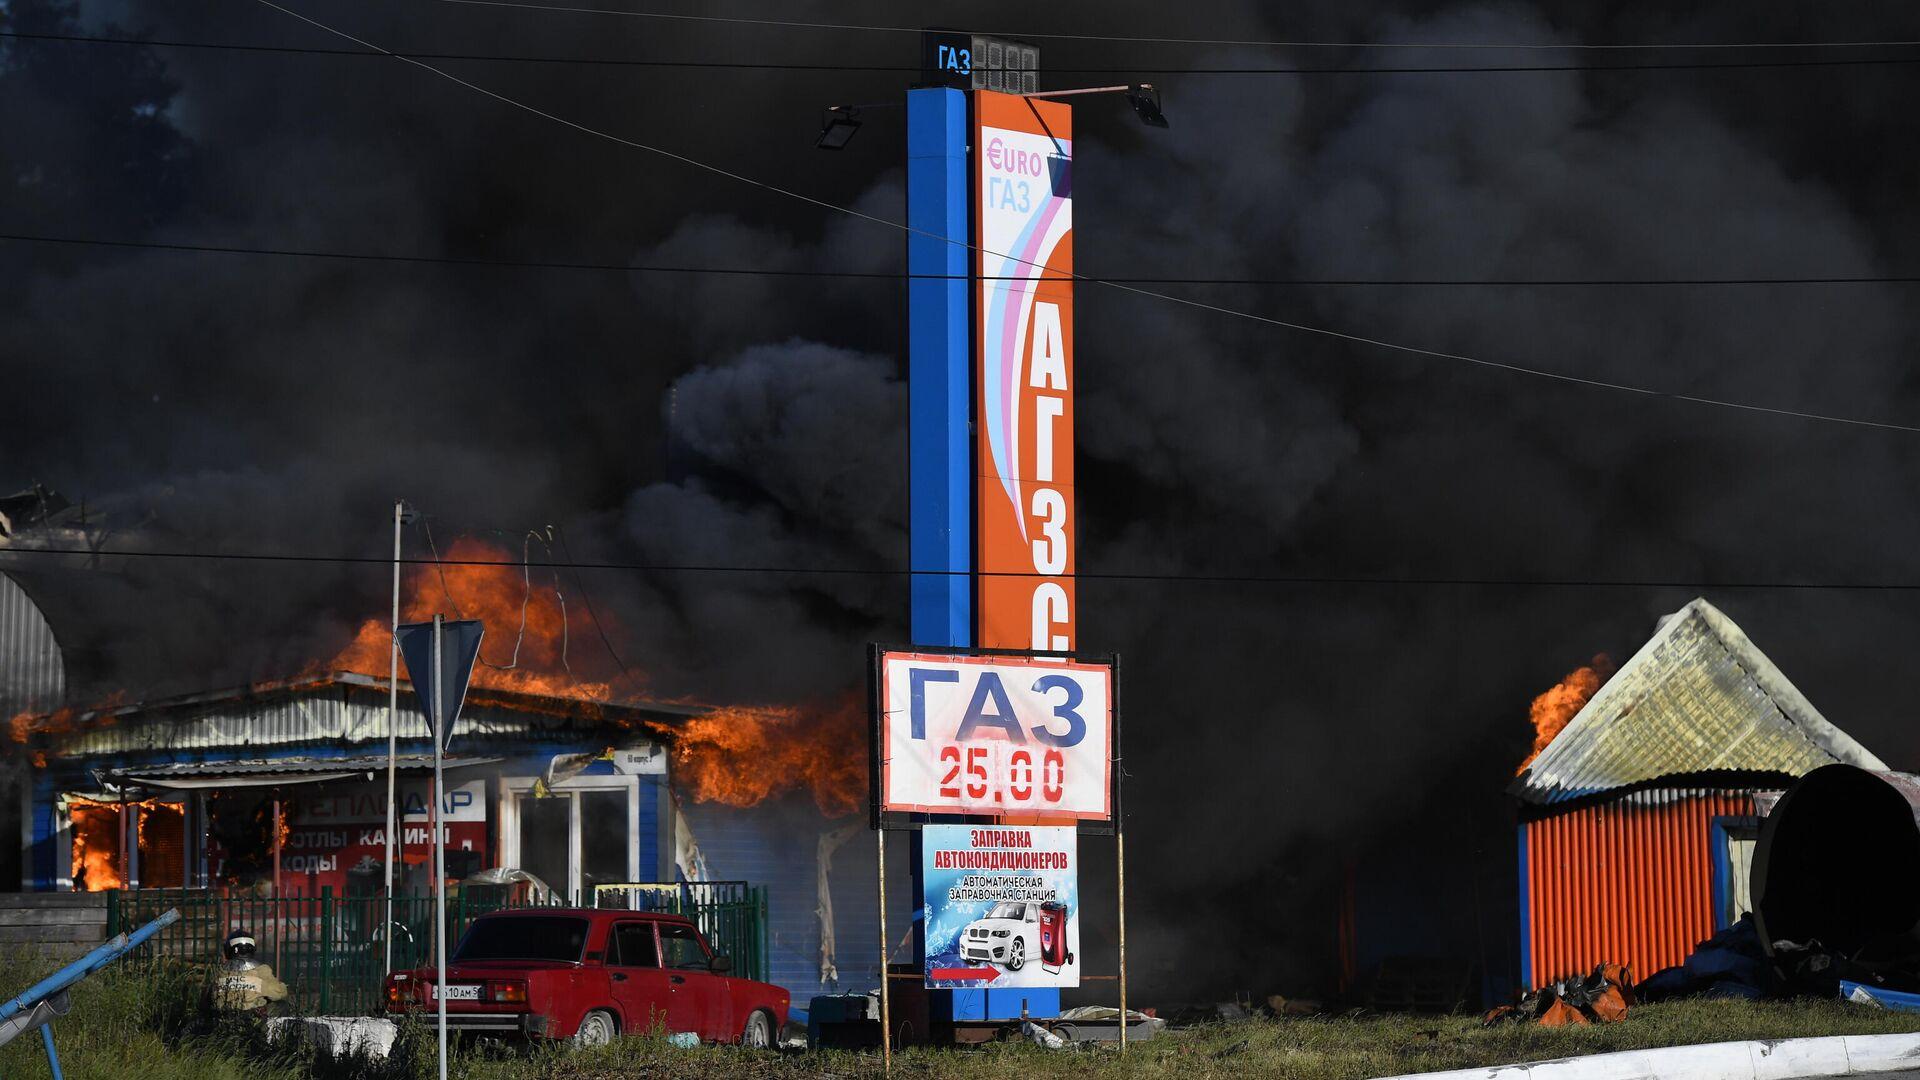 Автозаправка горит в Новосибирске - РИА Новости, 1920, 15.06.2021